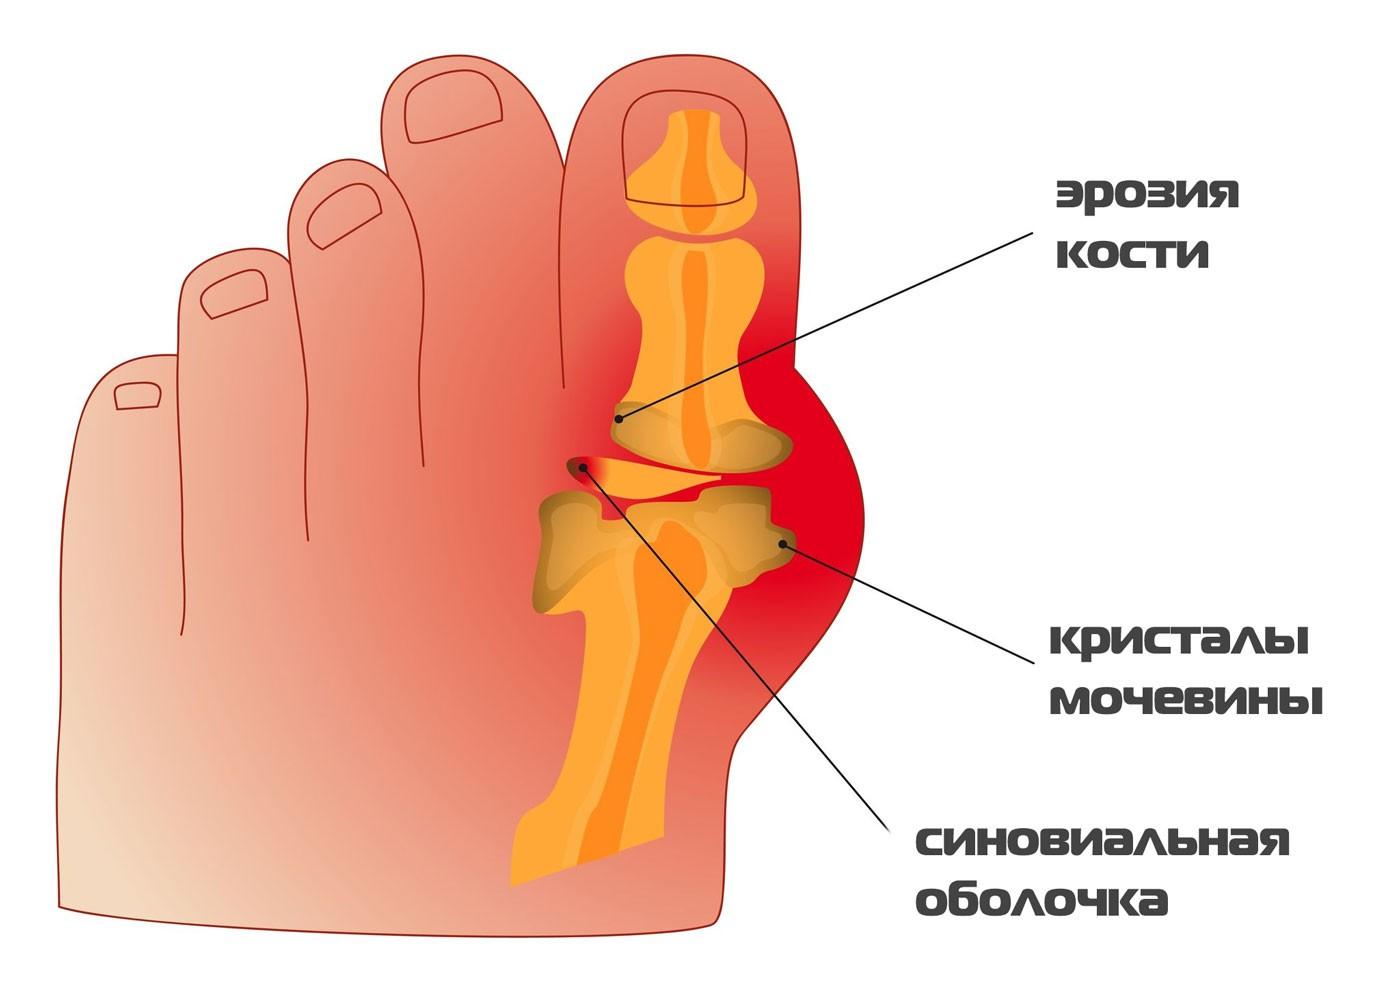 Артрит суставов с2-с7 таблетки от были в мышцах и суставах